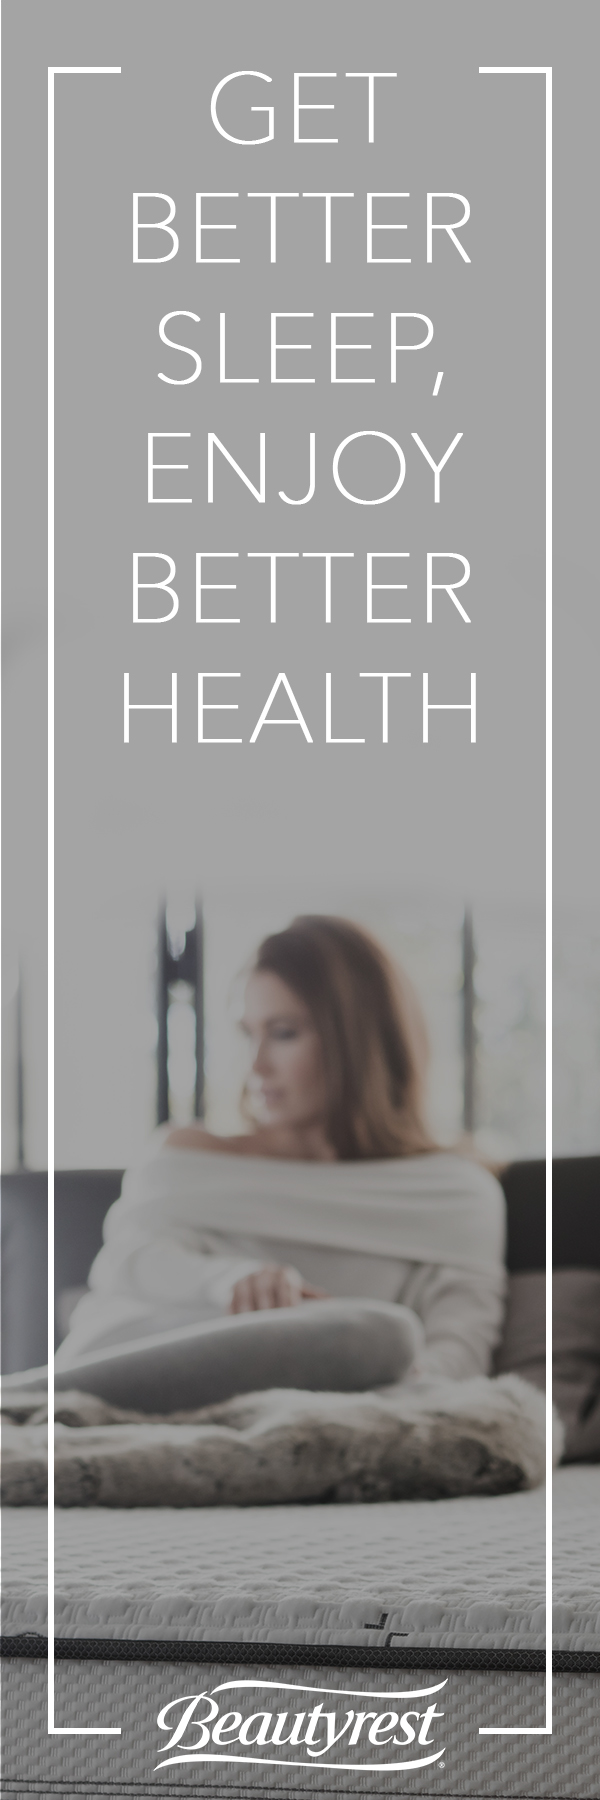 Better Sleep = Better Health. It's that simple, folks